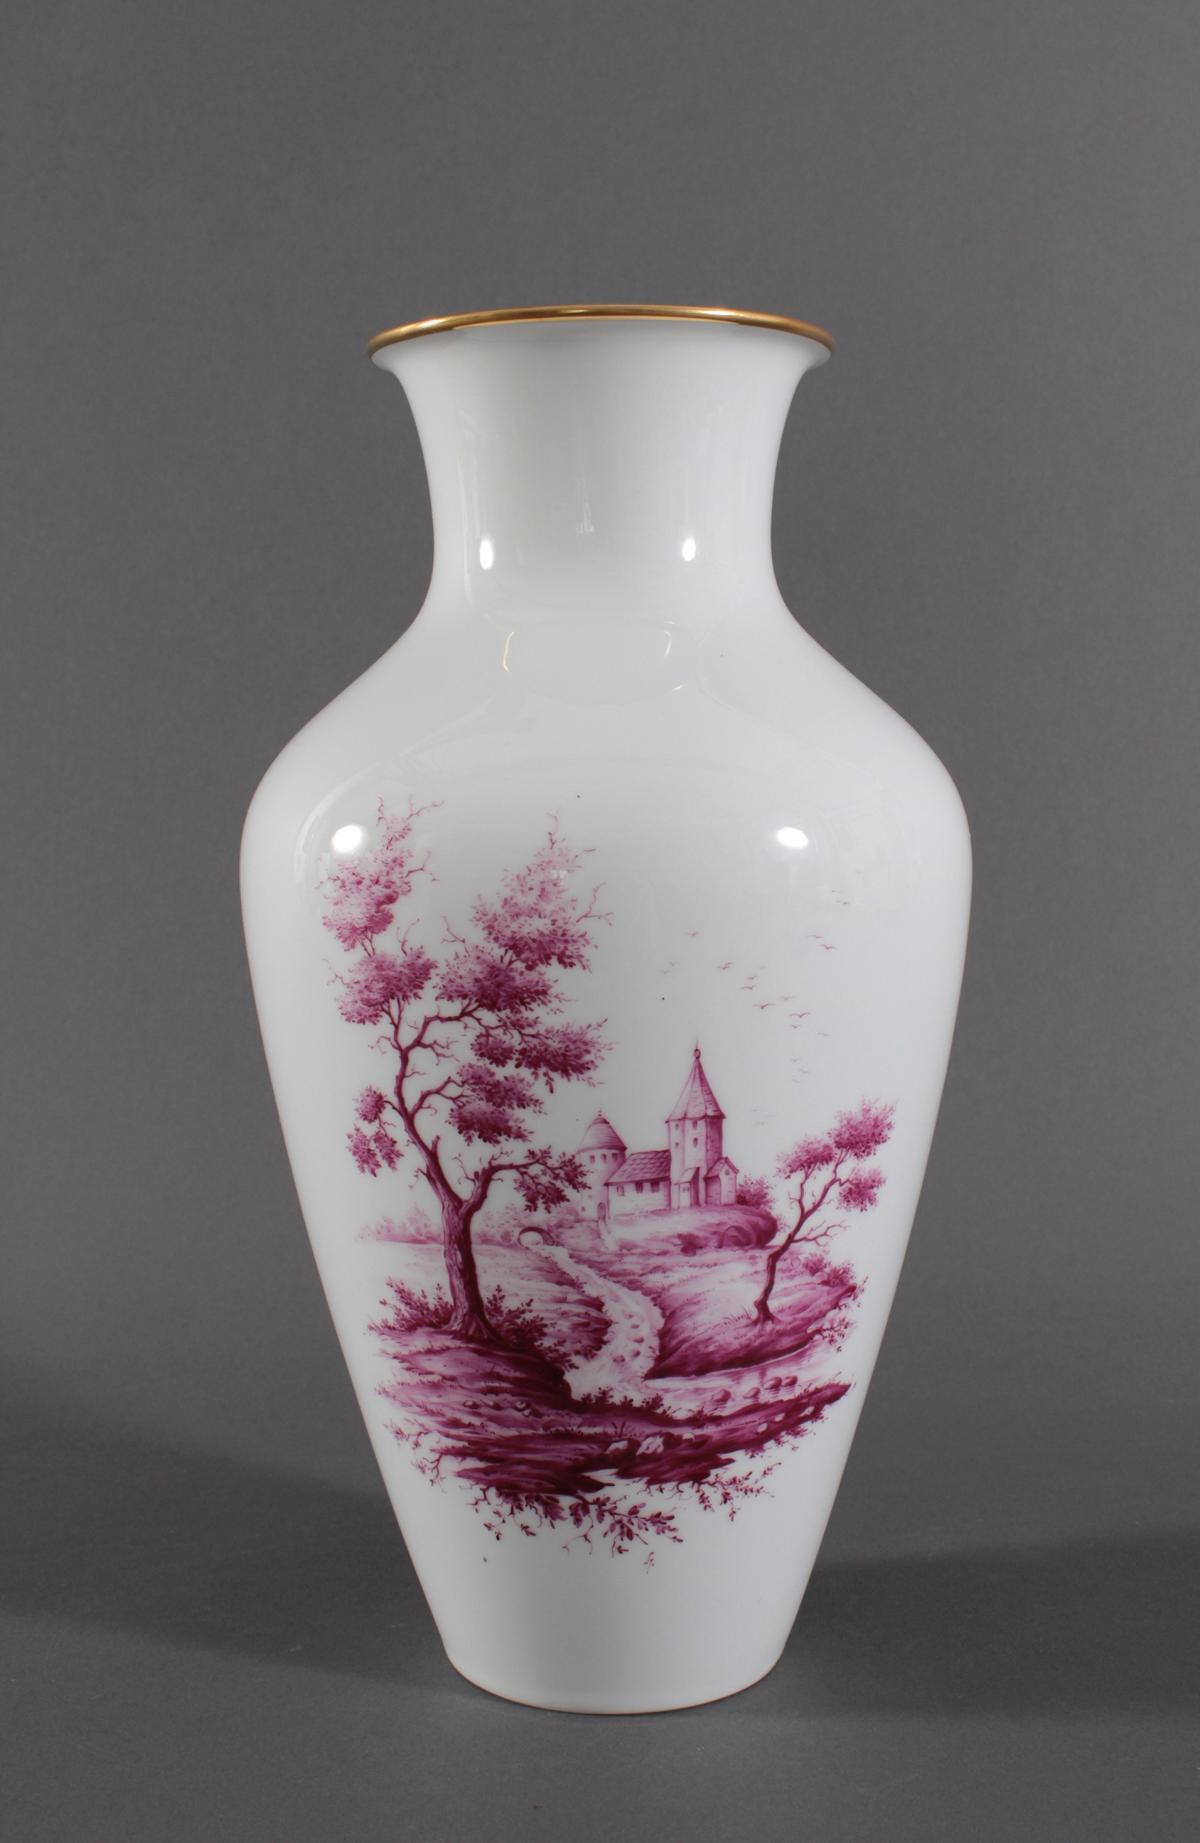 Große Vase, Höchster Porzellanmanufaktur, Malersignatur Kurt Schröder